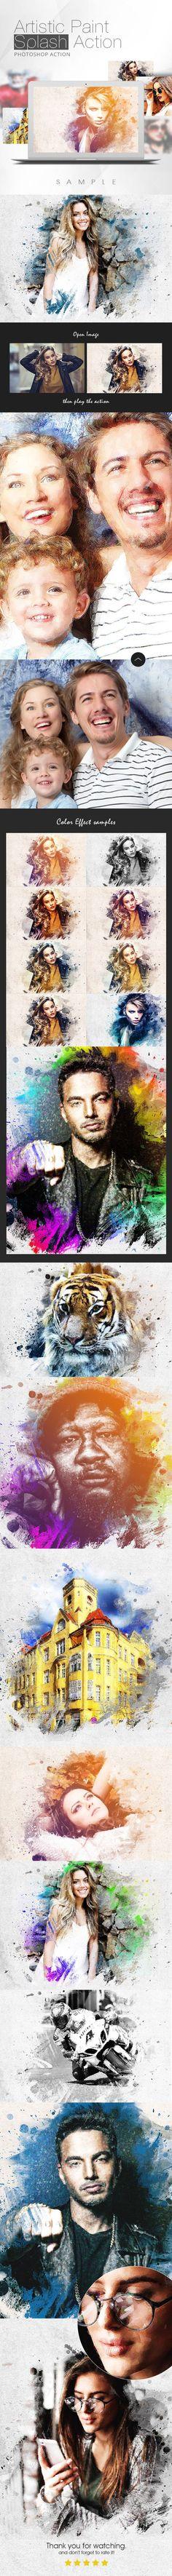 Artistic Paint Splash Action - Photo Effects Actions